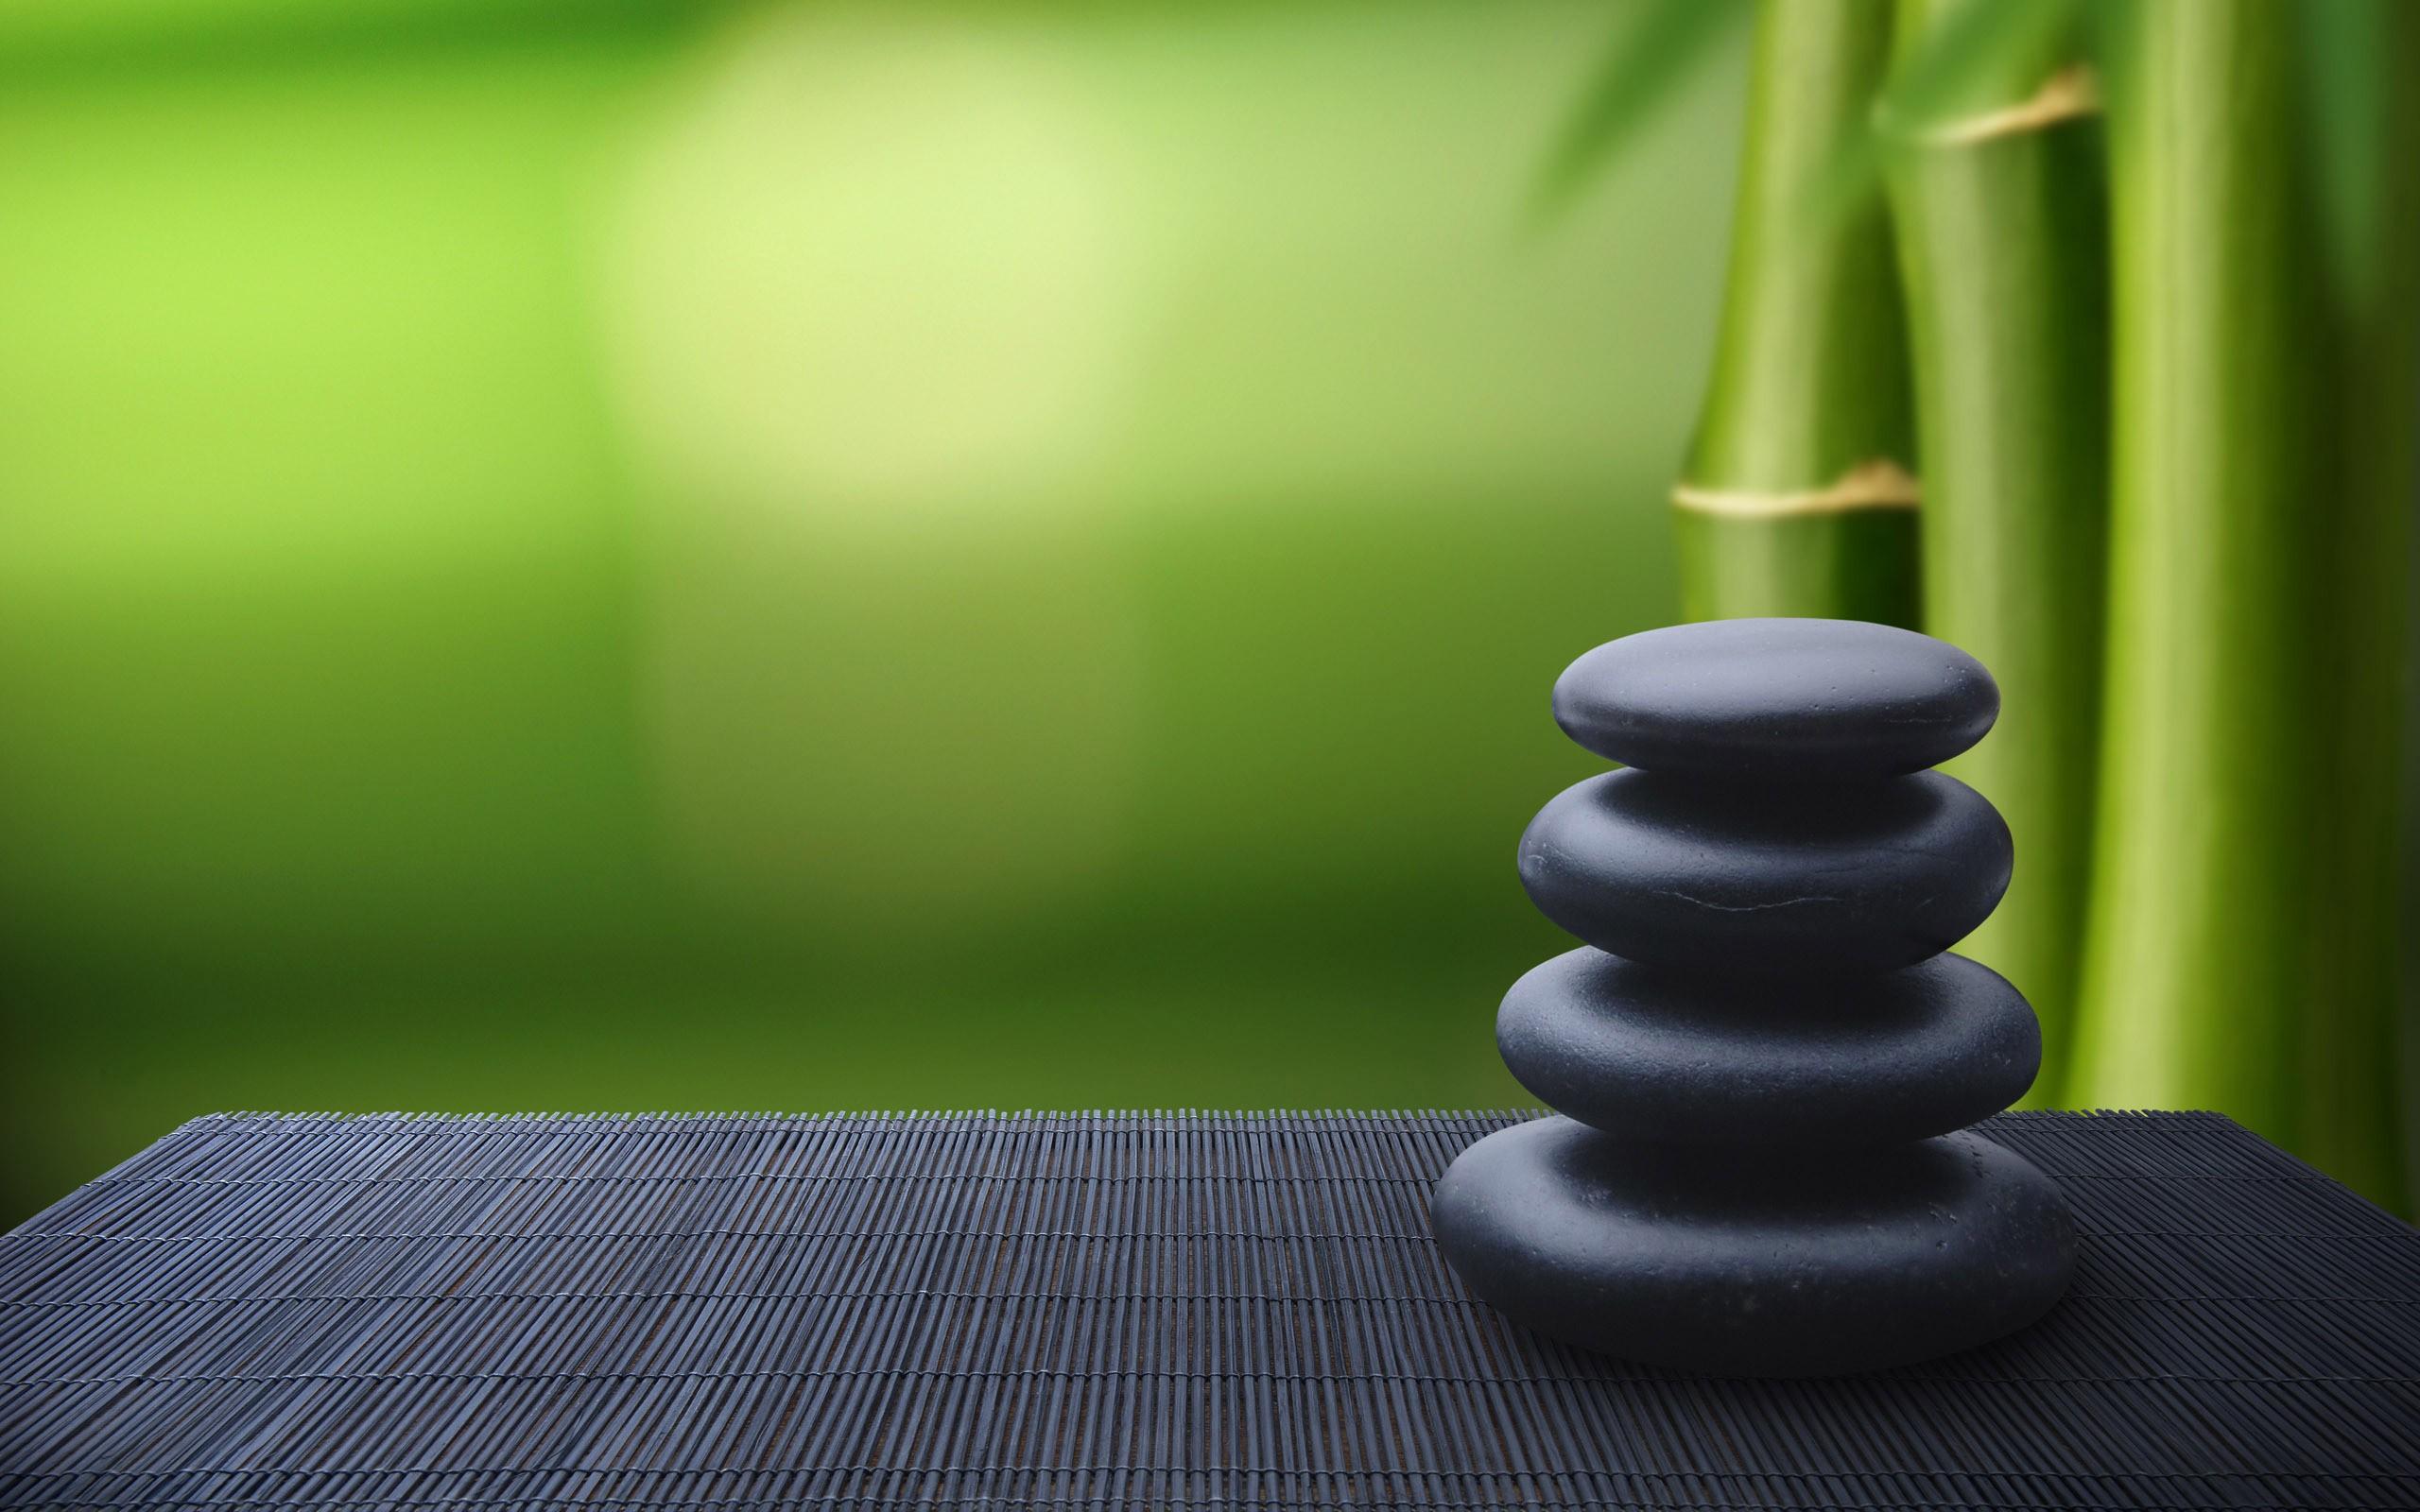 Bamboo and zen stones wallpaper Wallpaper Wide HD 2560x1600